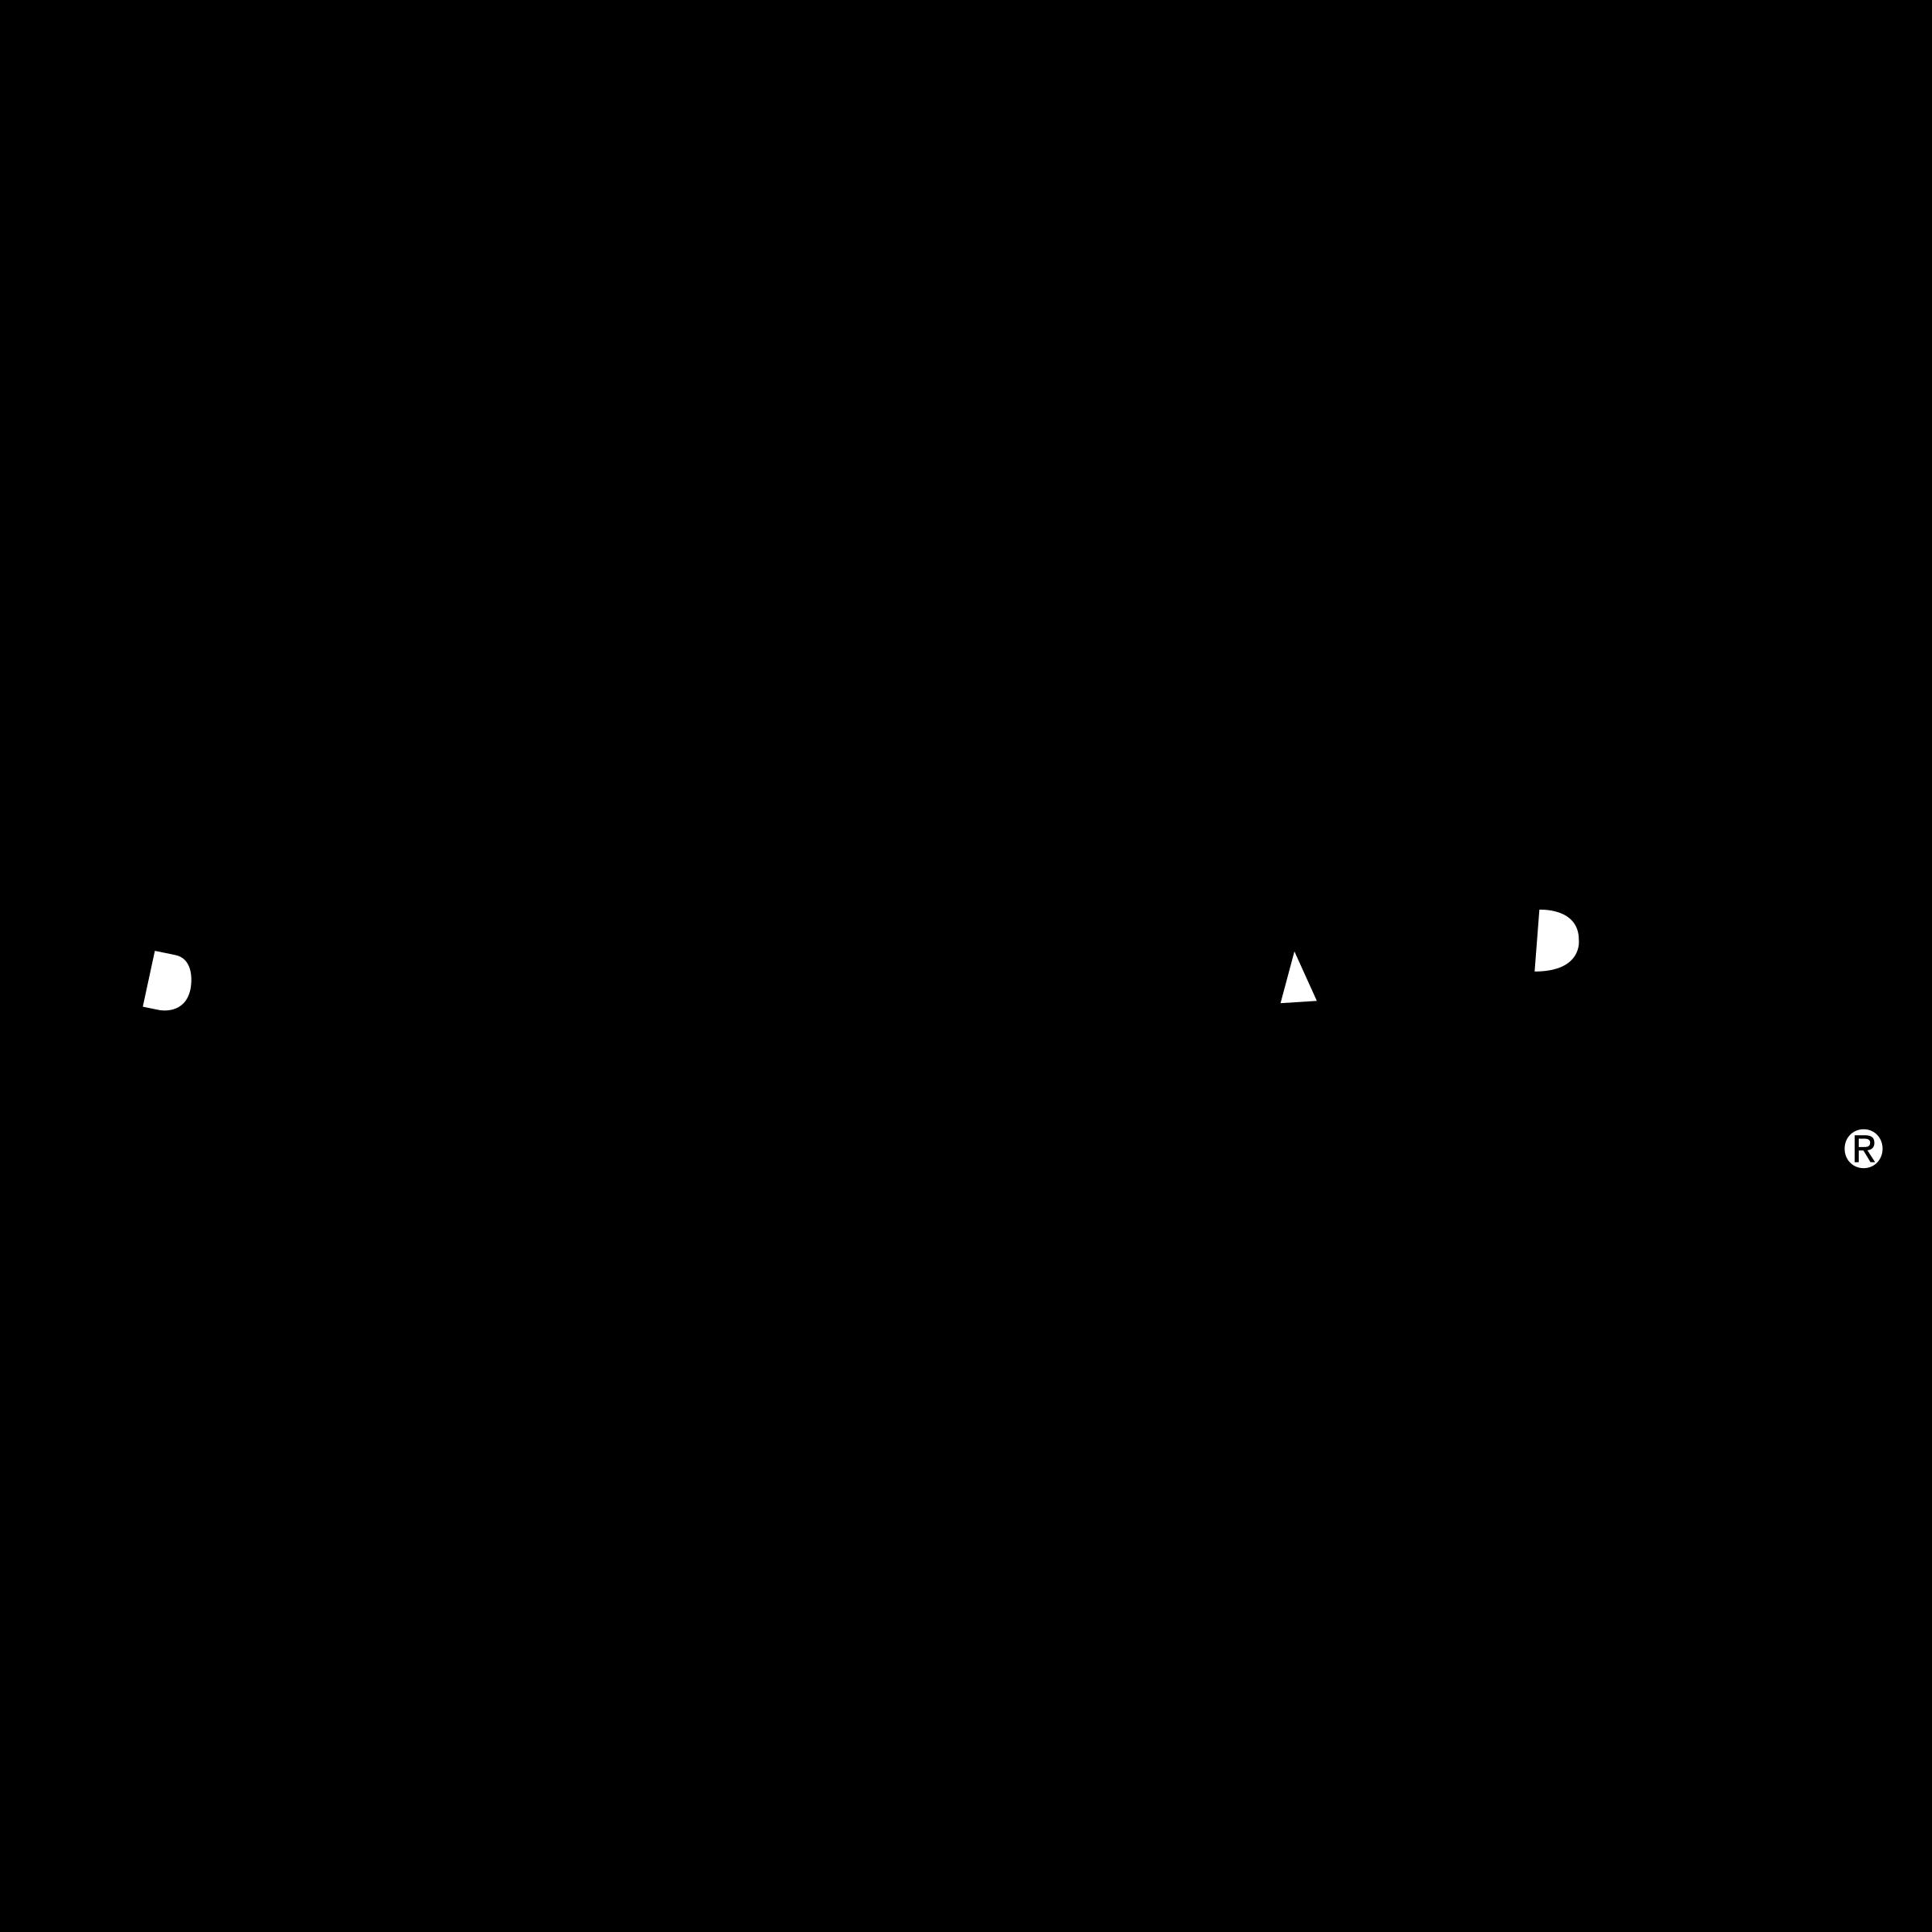 PETsMART Logo PNG Transparent & SVG Vector.